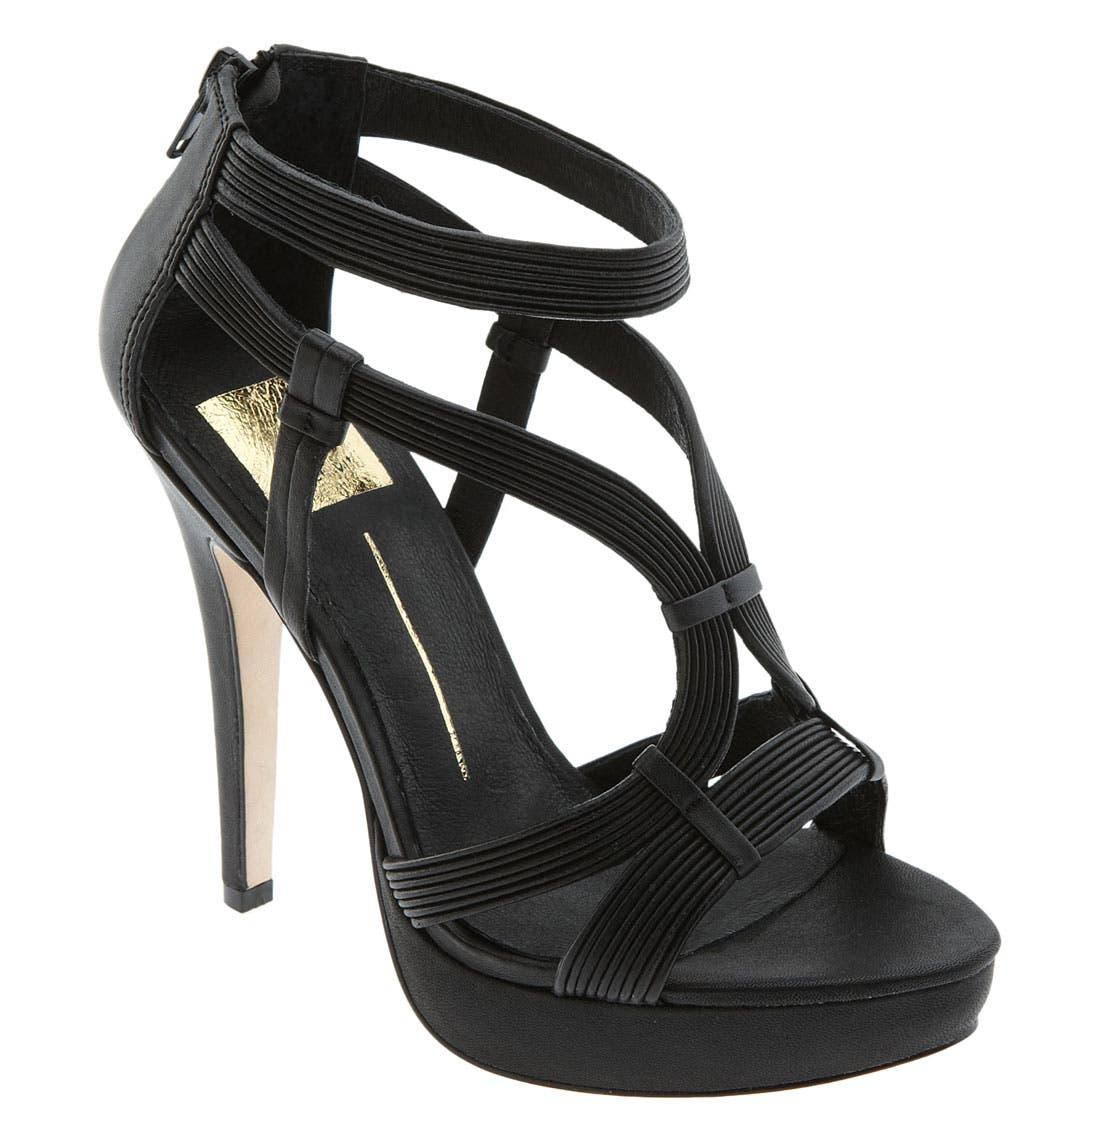 Alternate Image 1 Selected - Dolce Vita 'Lance' Sandal